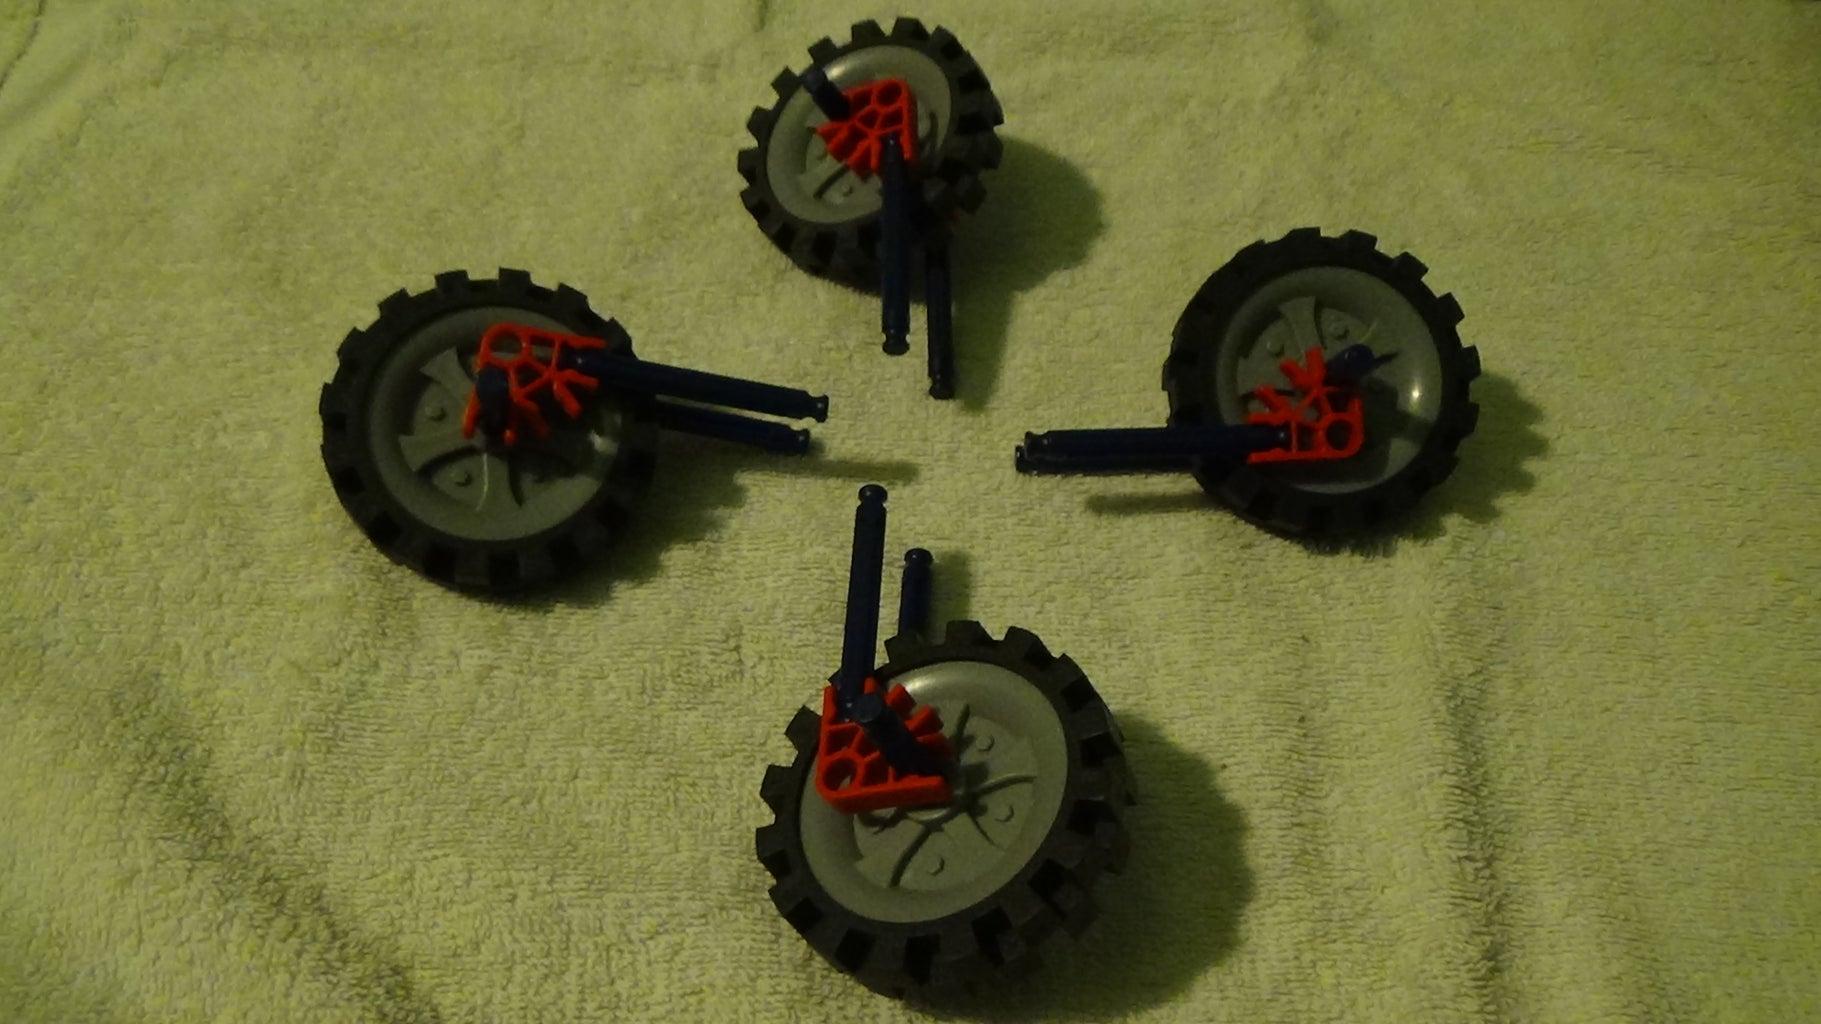 The Flywheel